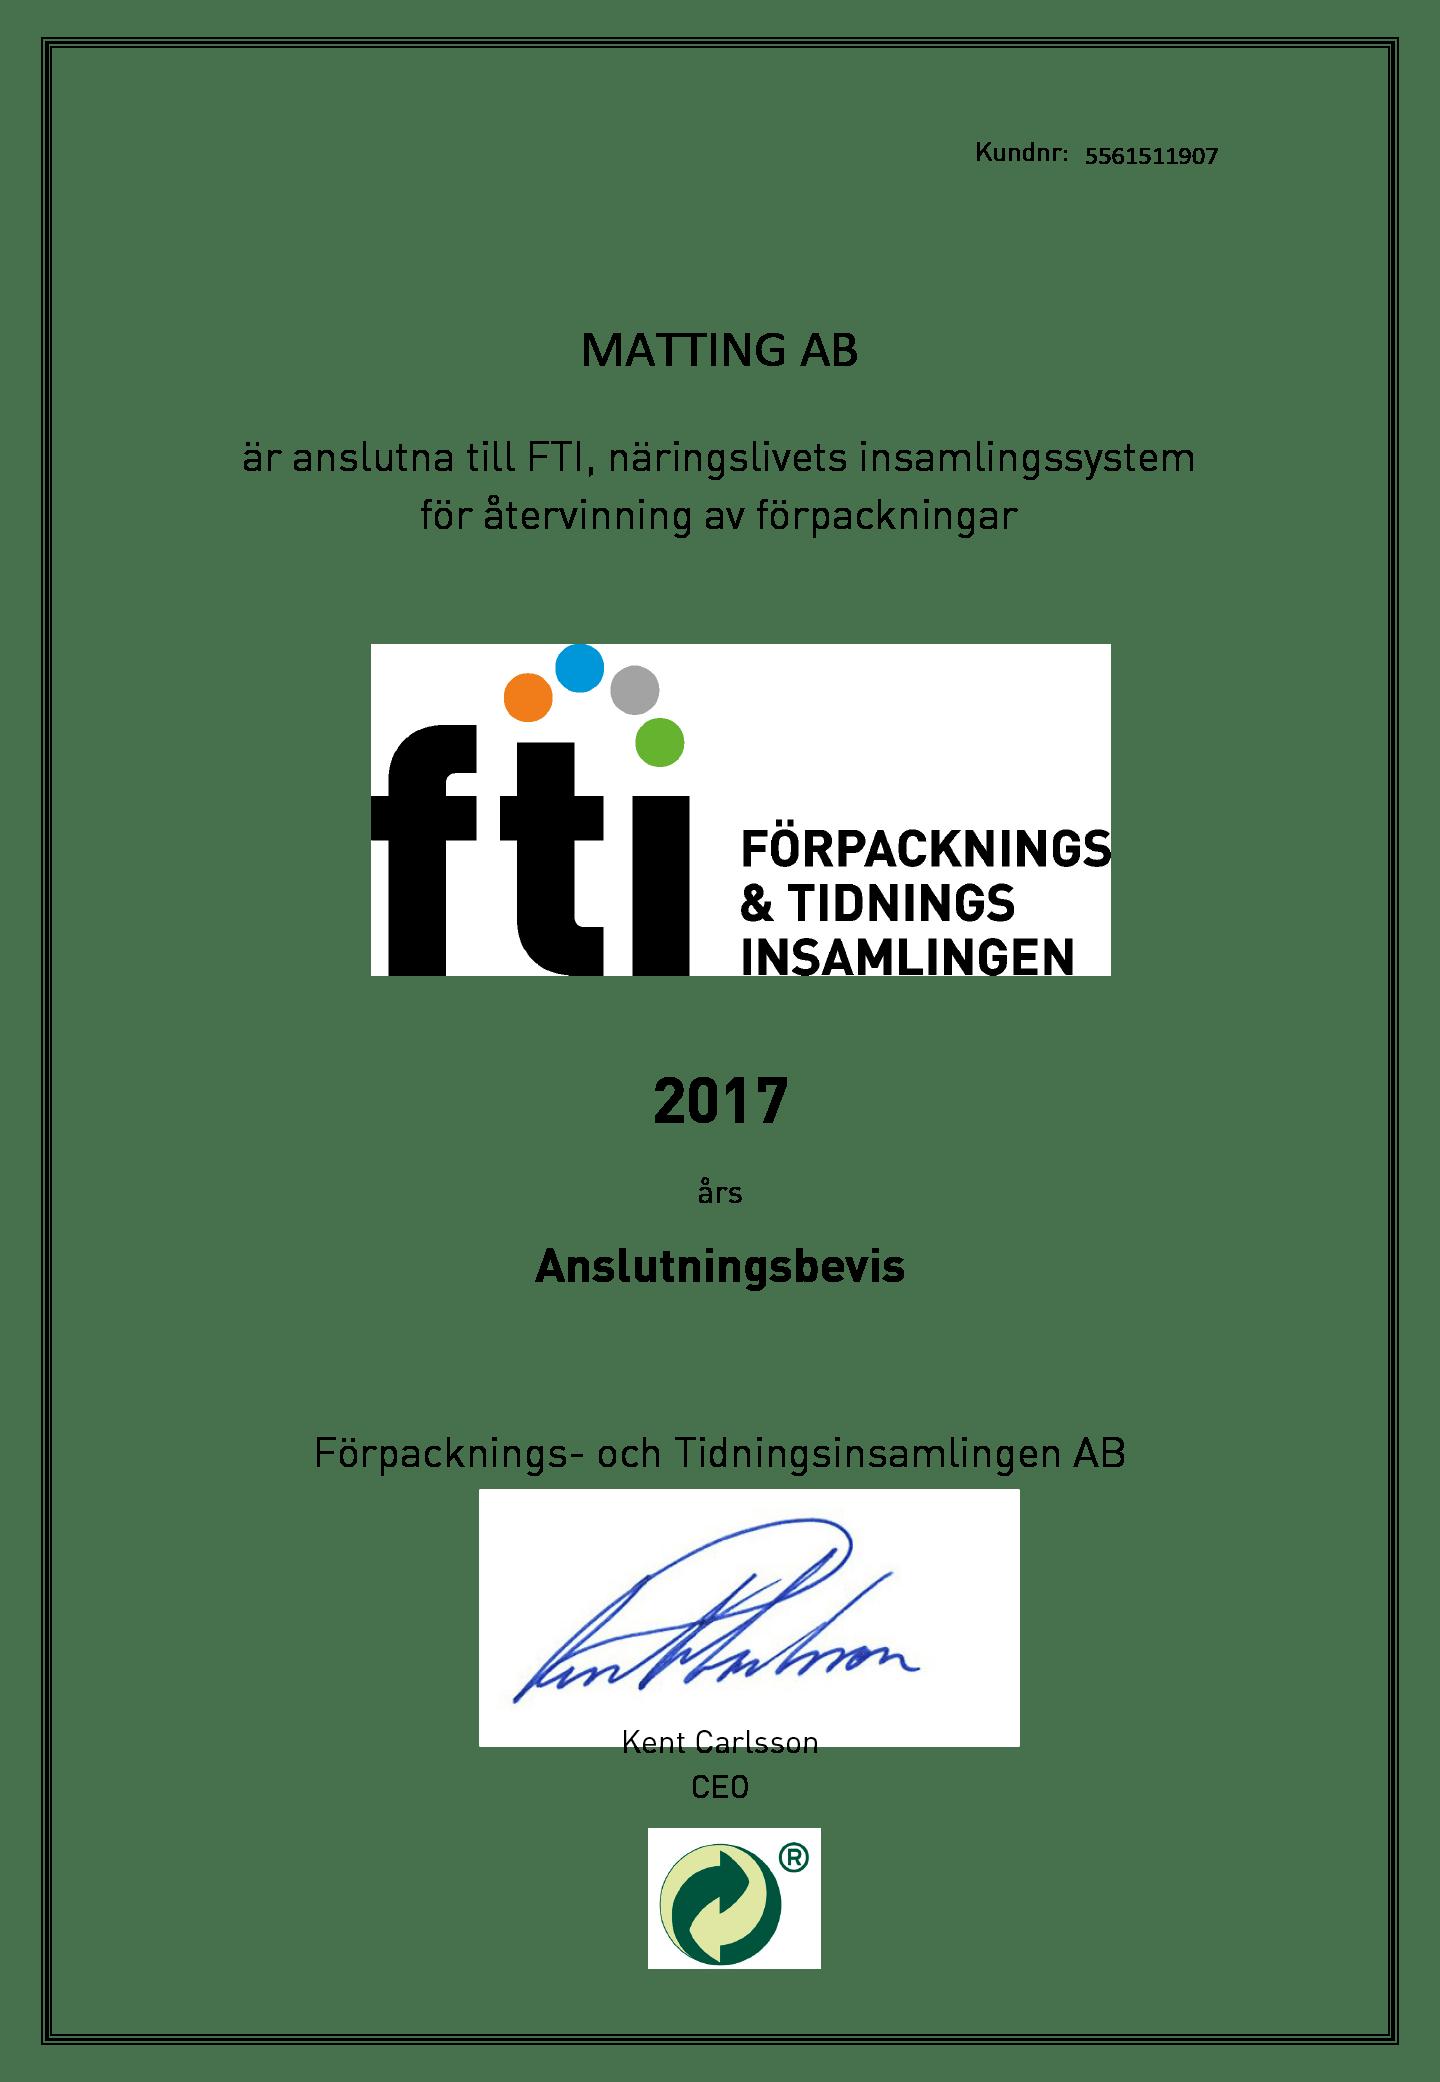 FTI Anslutningsbevis 2017